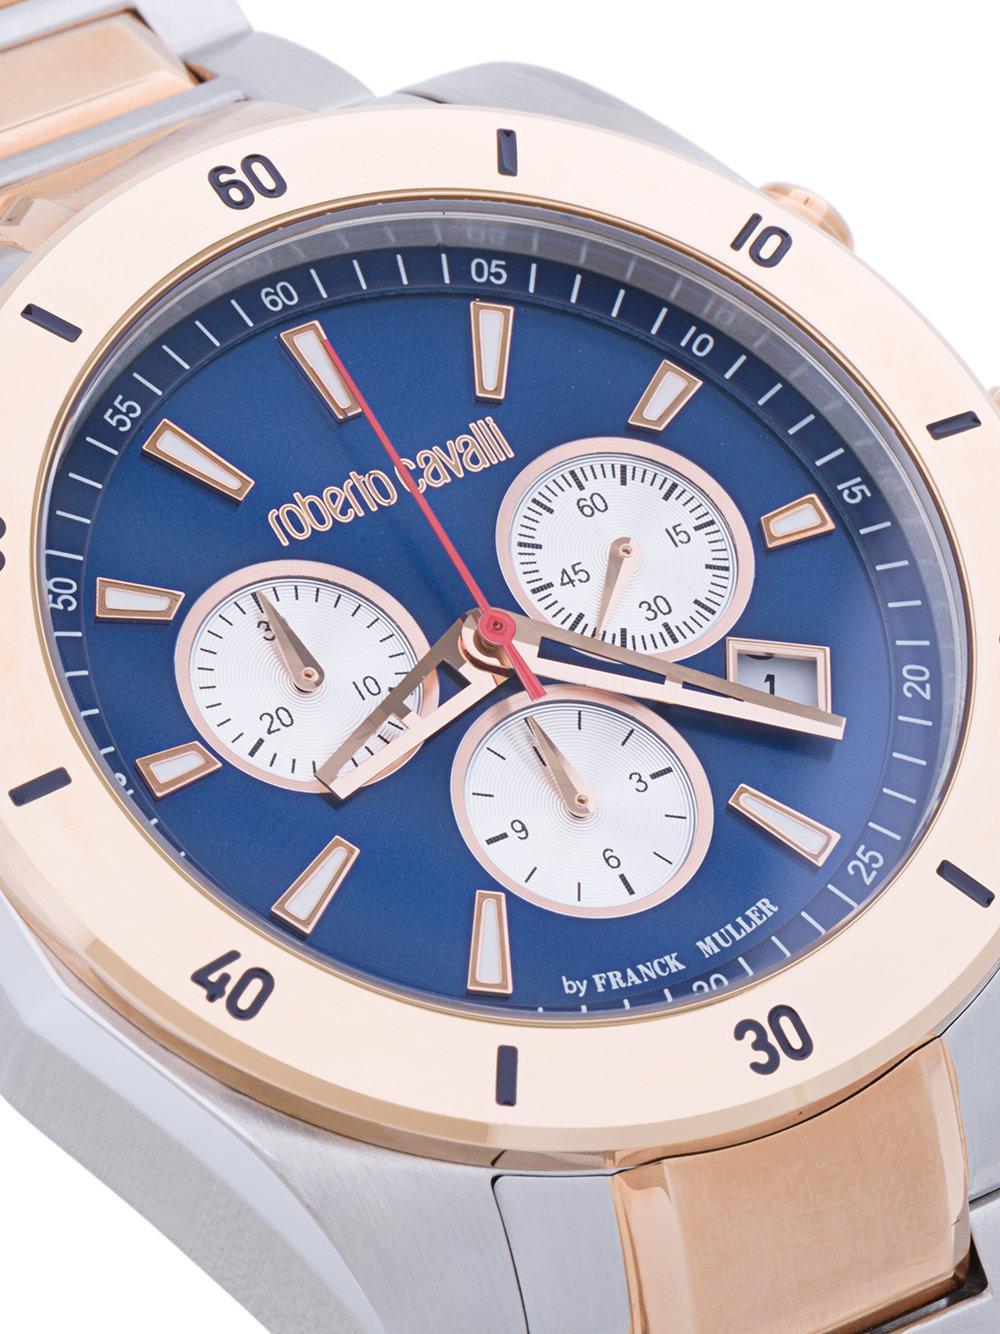 188d0ceb7b5f Reloj con cronógrafo Franck Muller Roberto Cavalli de hombre de ...